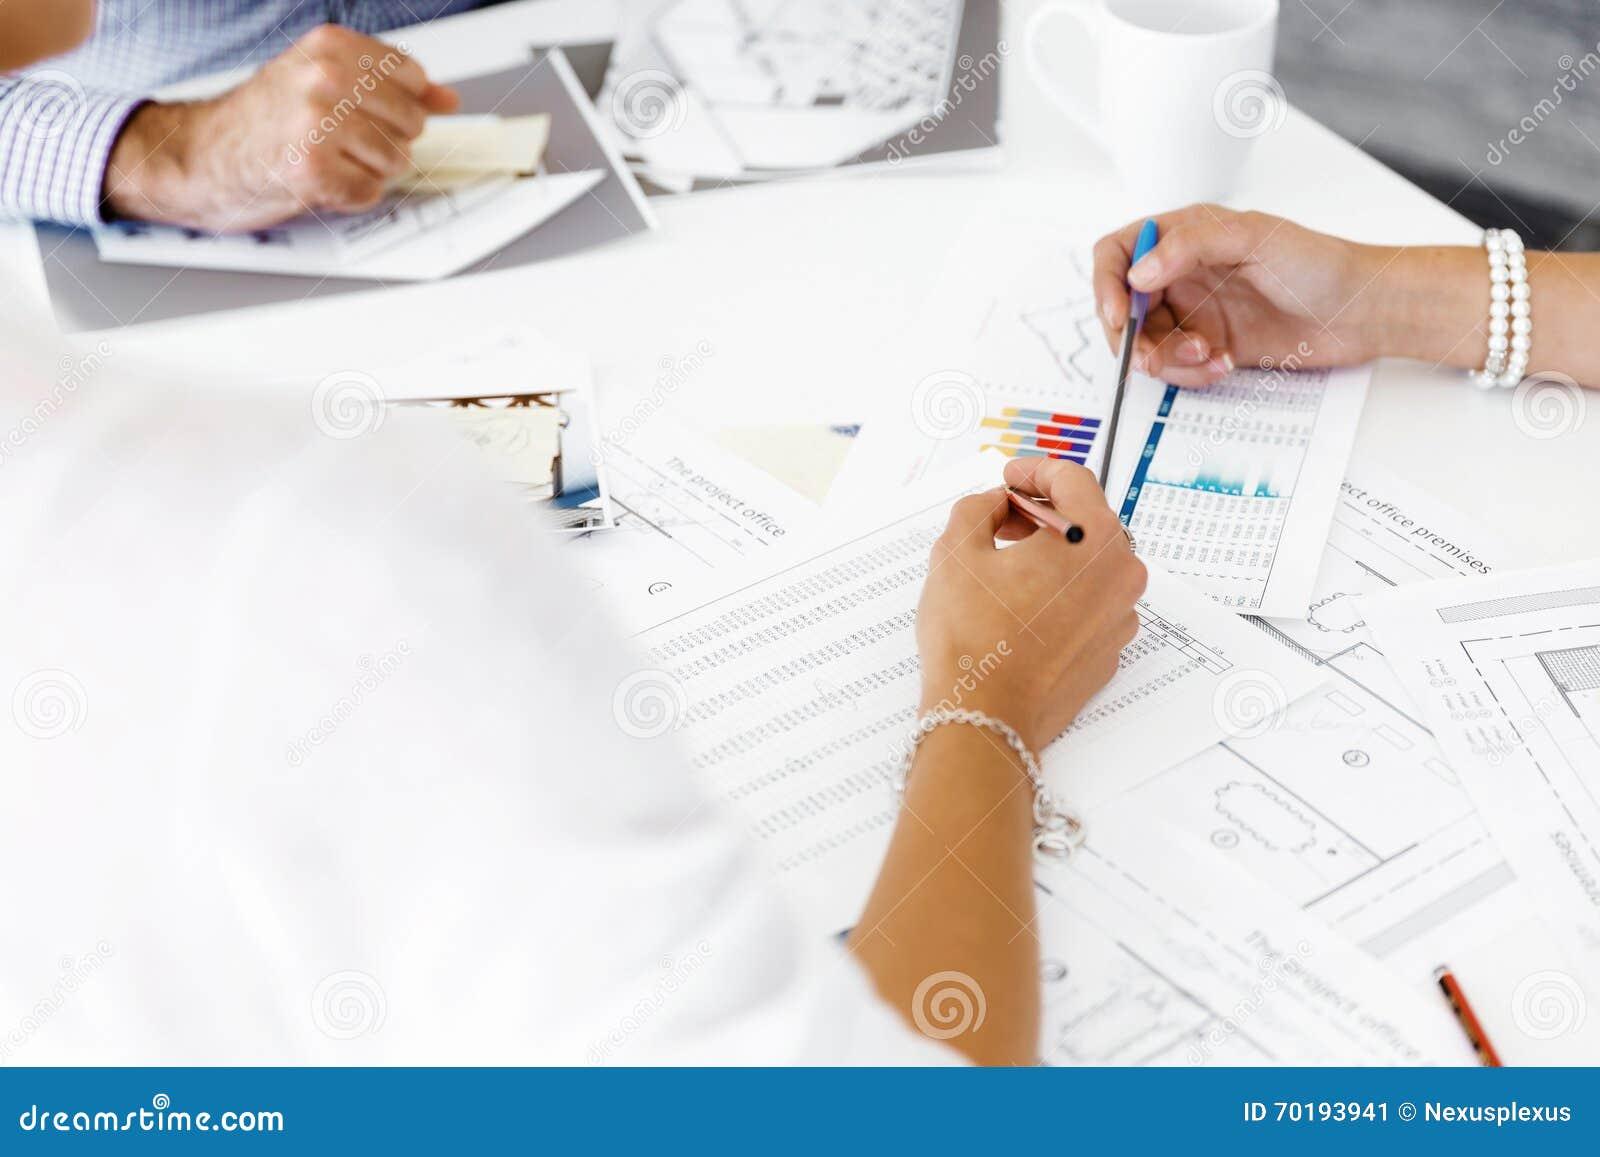 Händer som skriver på papper